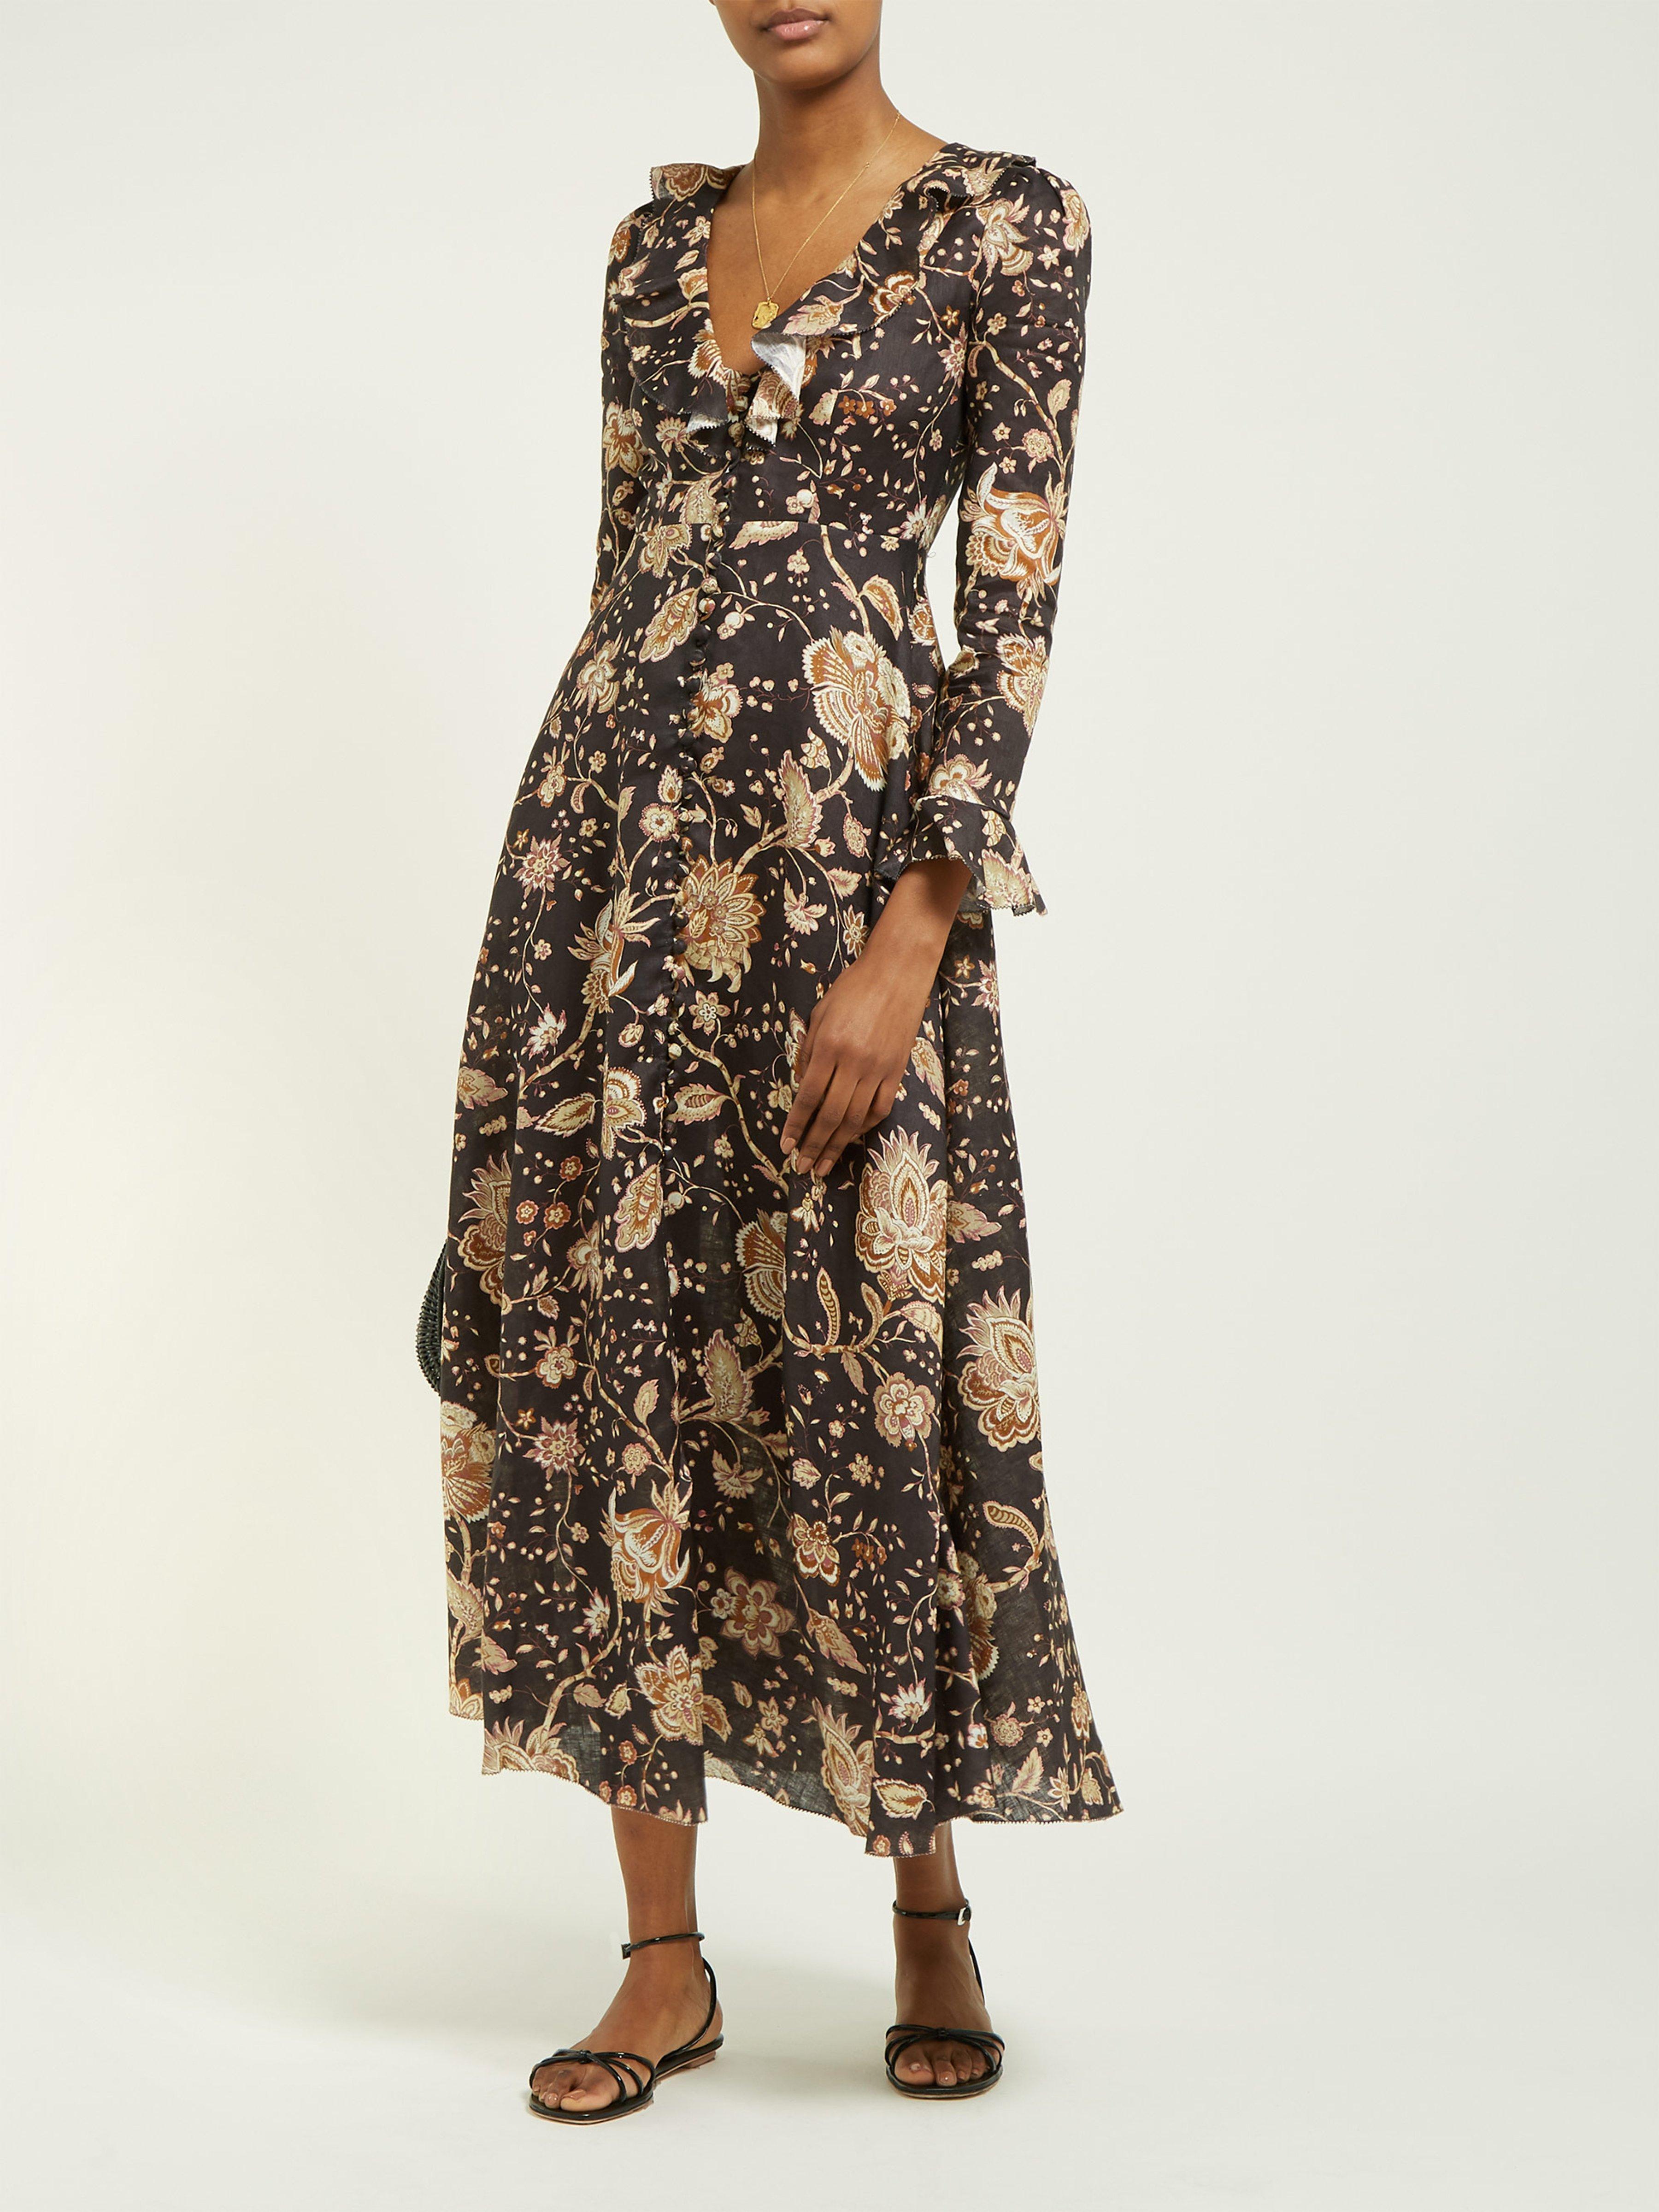 bebd8db82c3 Zimmermann Veneto Floral Print Linen Dress - Lyst